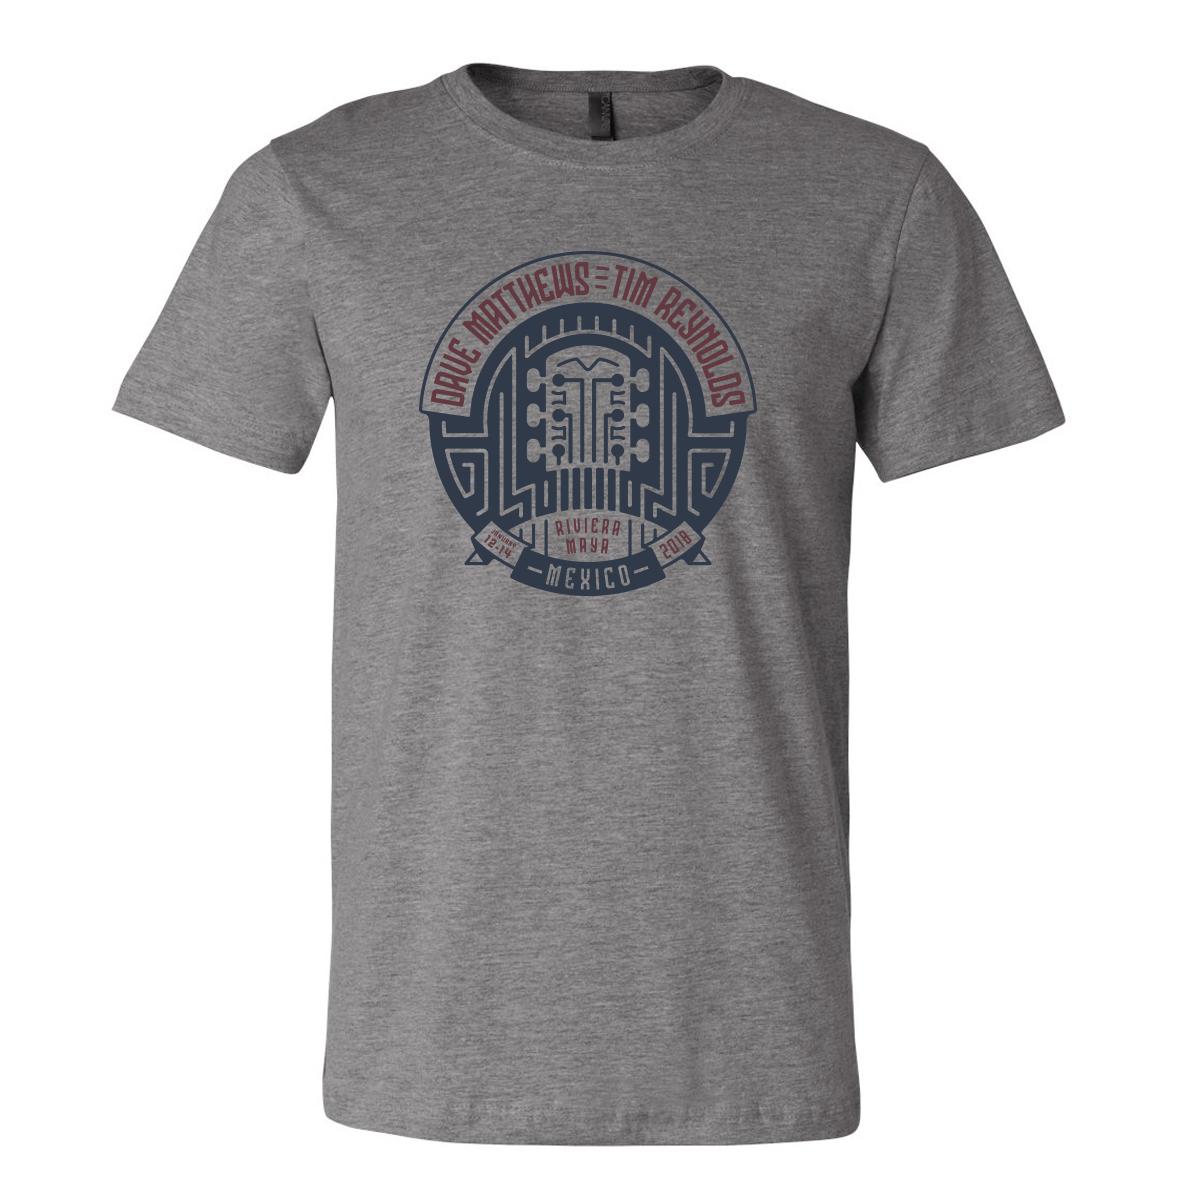 Dave & Tim - Riviera Maya 2018 Event T-shirt